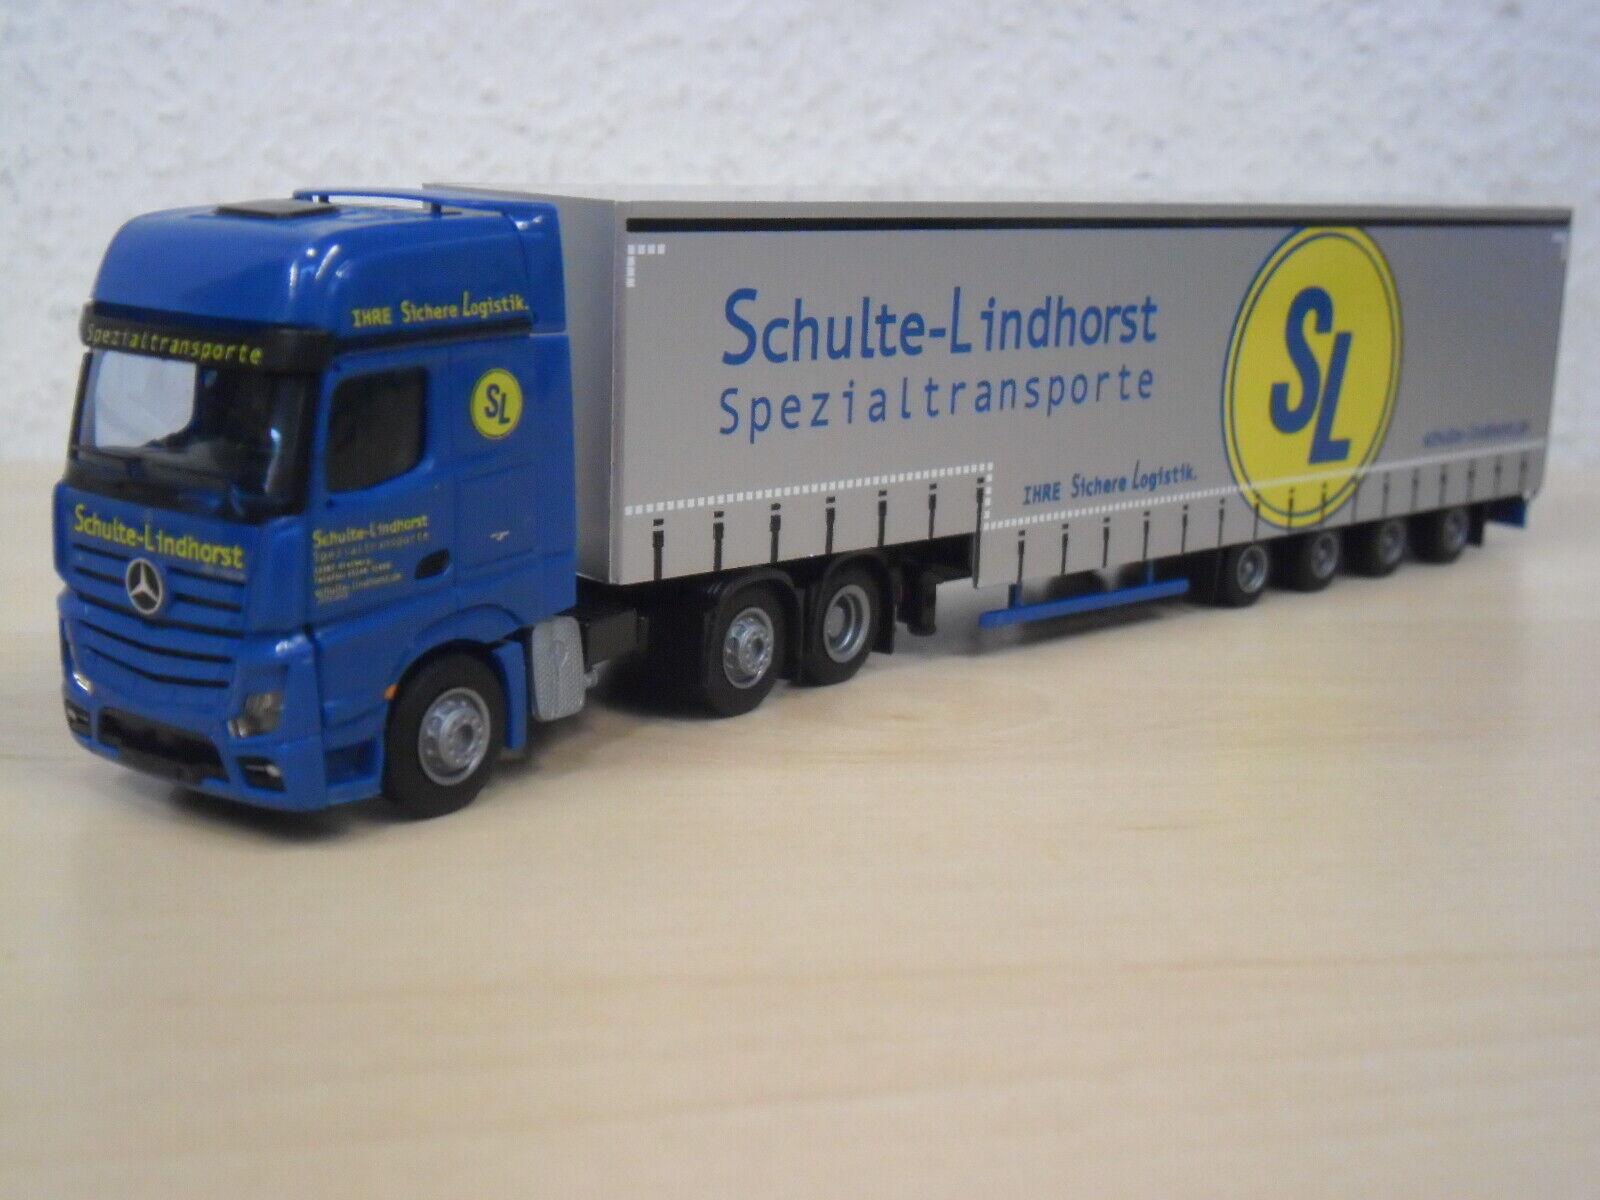 AWM - MB Actros GigaSpace Meusburger VolSZ  Schulte-Lindhorst  - 8662.81 - 1 87